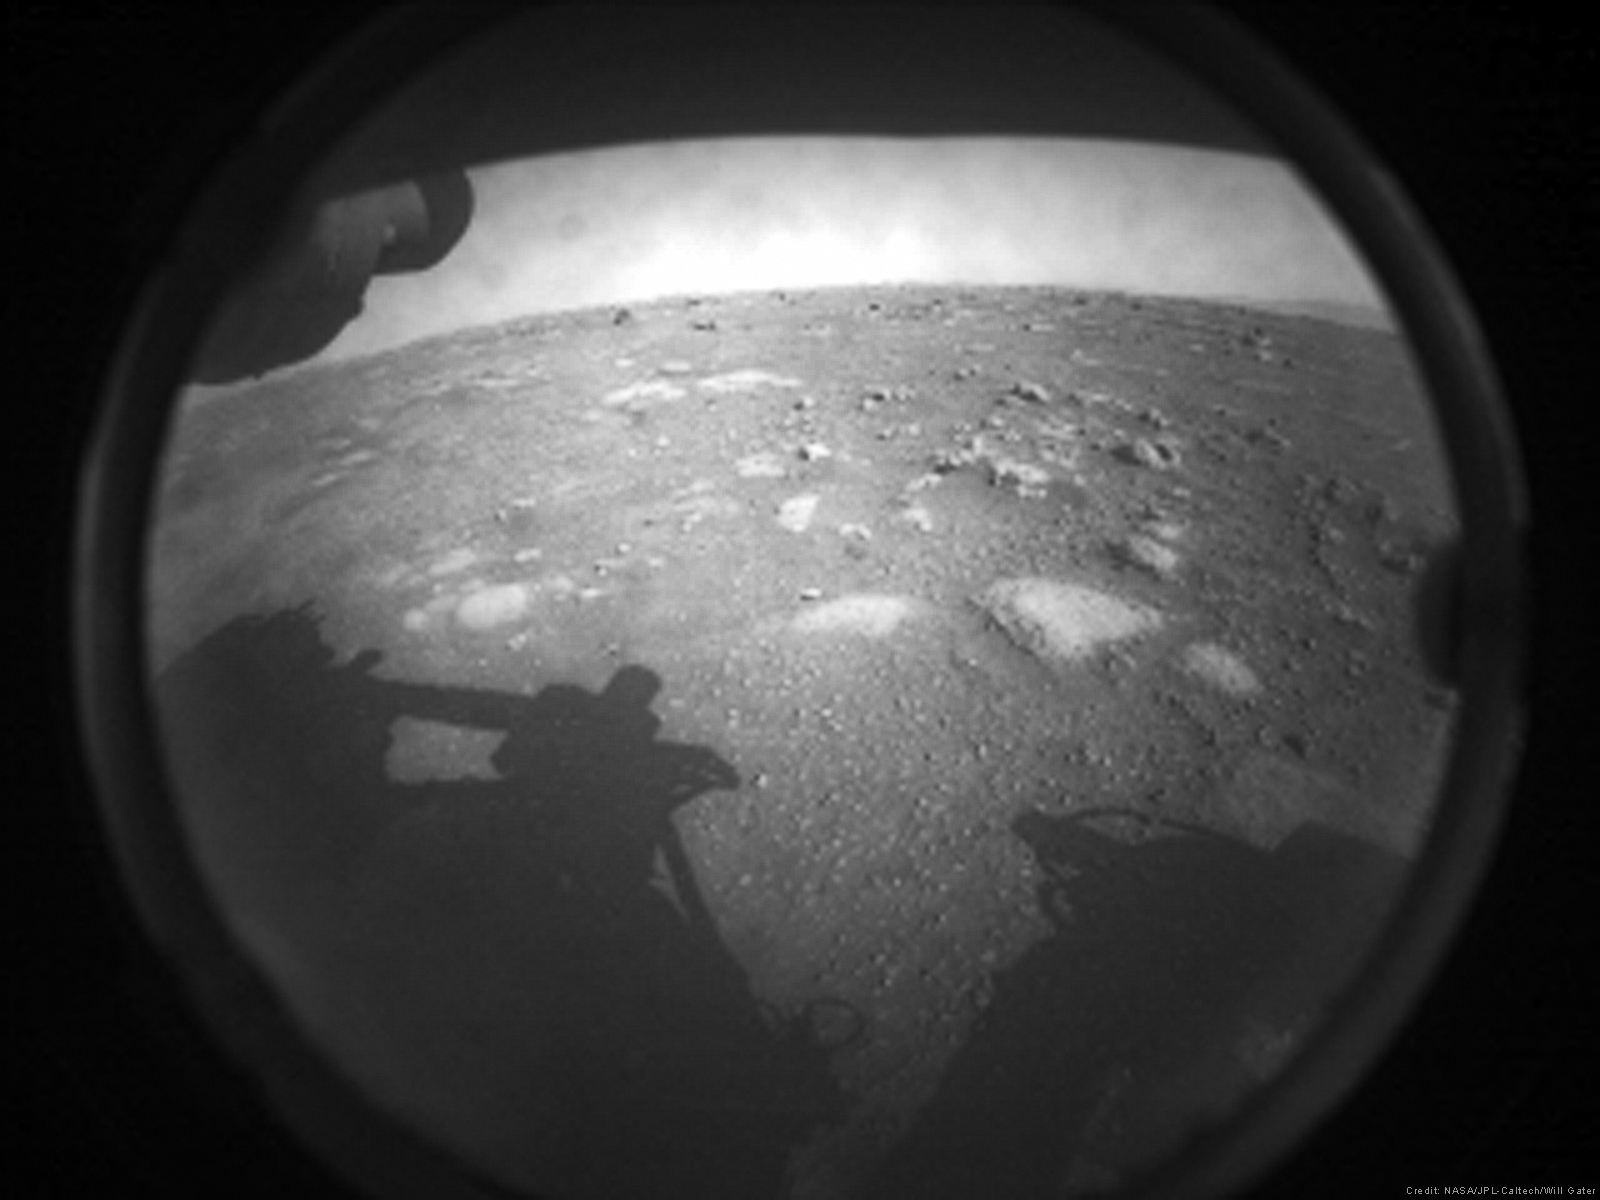 Mars 2020 (Perseverance) : exploration du cratère Jezero 11783